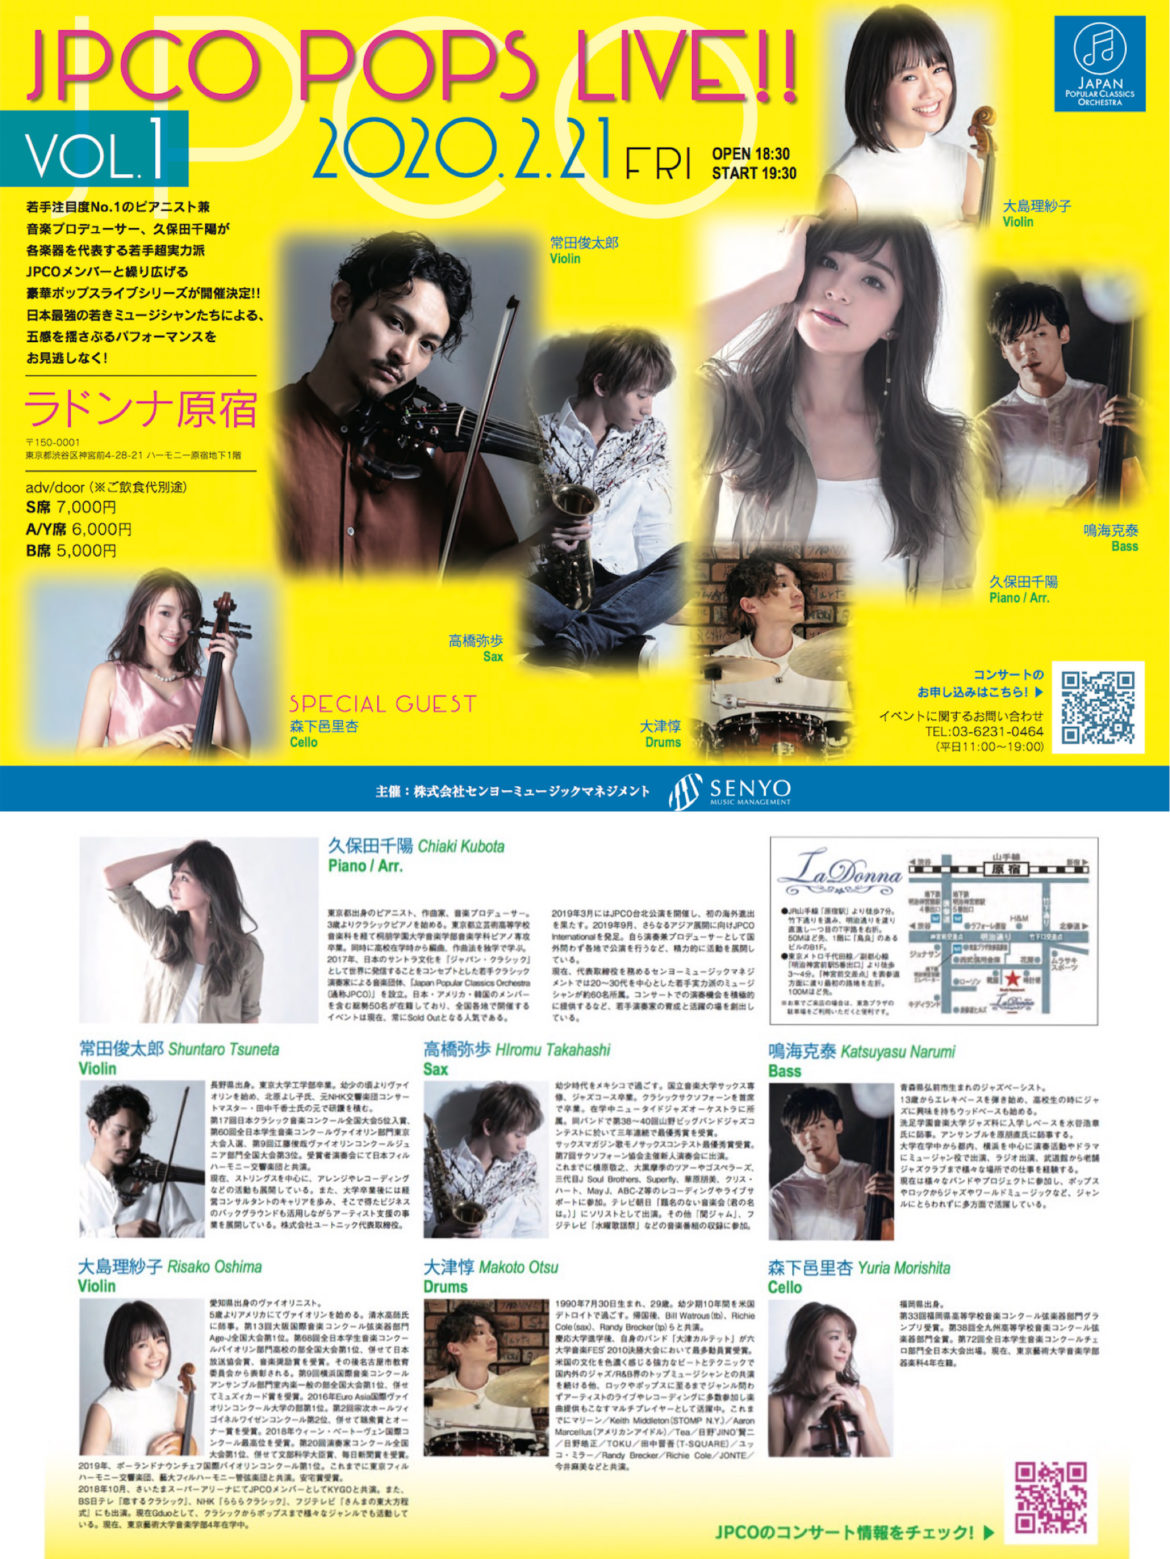 2020.2.21  JPCO POPS LIVE!! vol.1